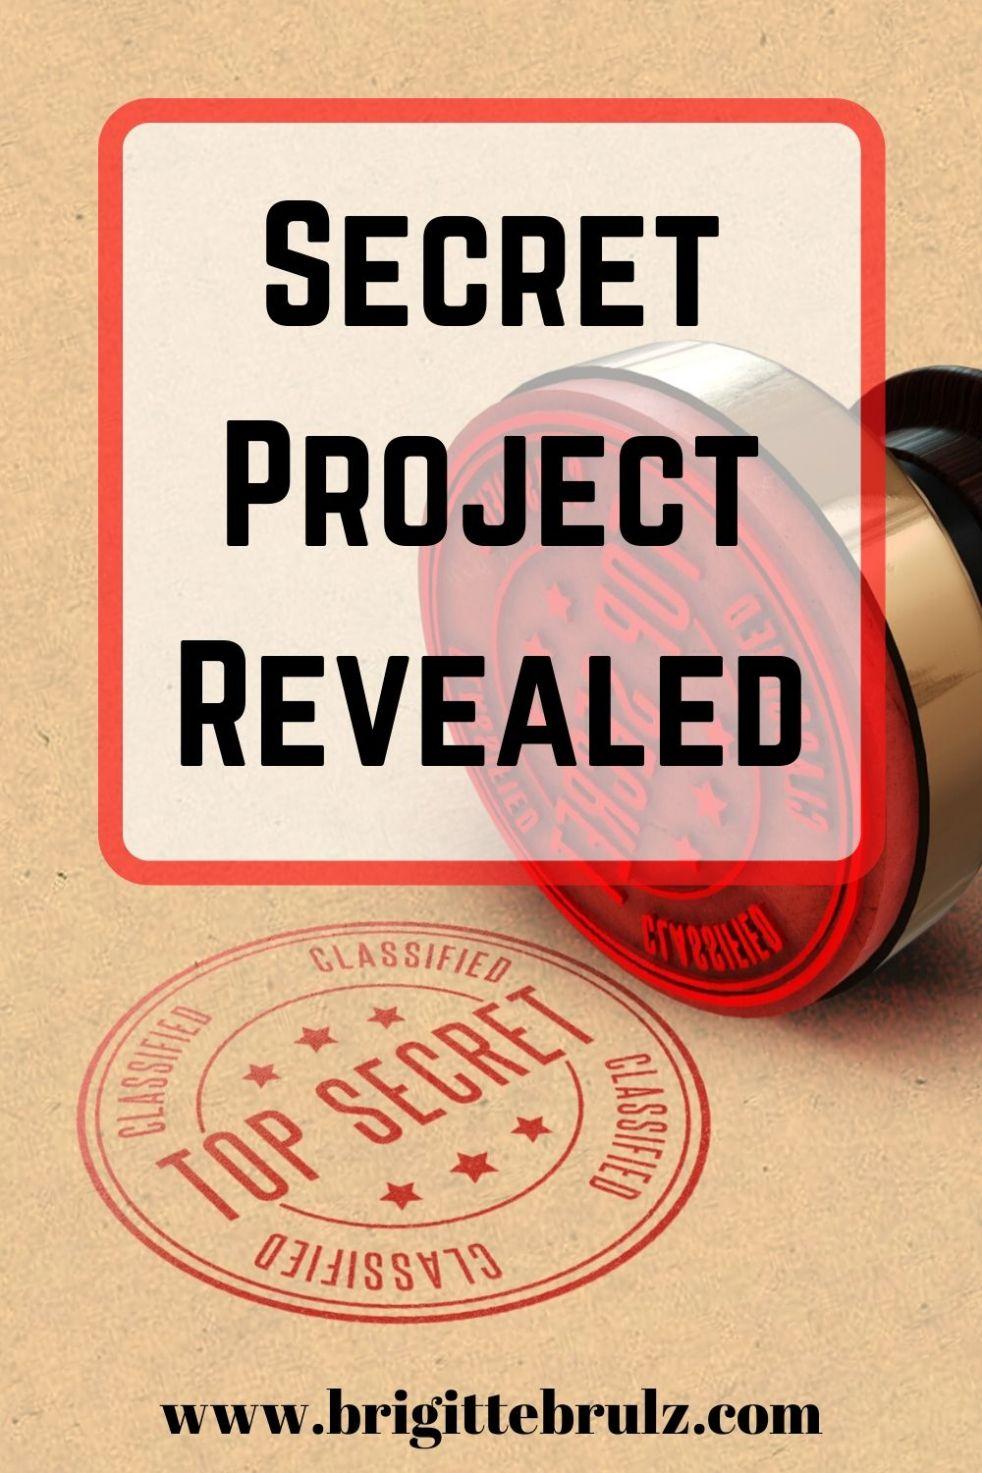 Secret Project Revealed